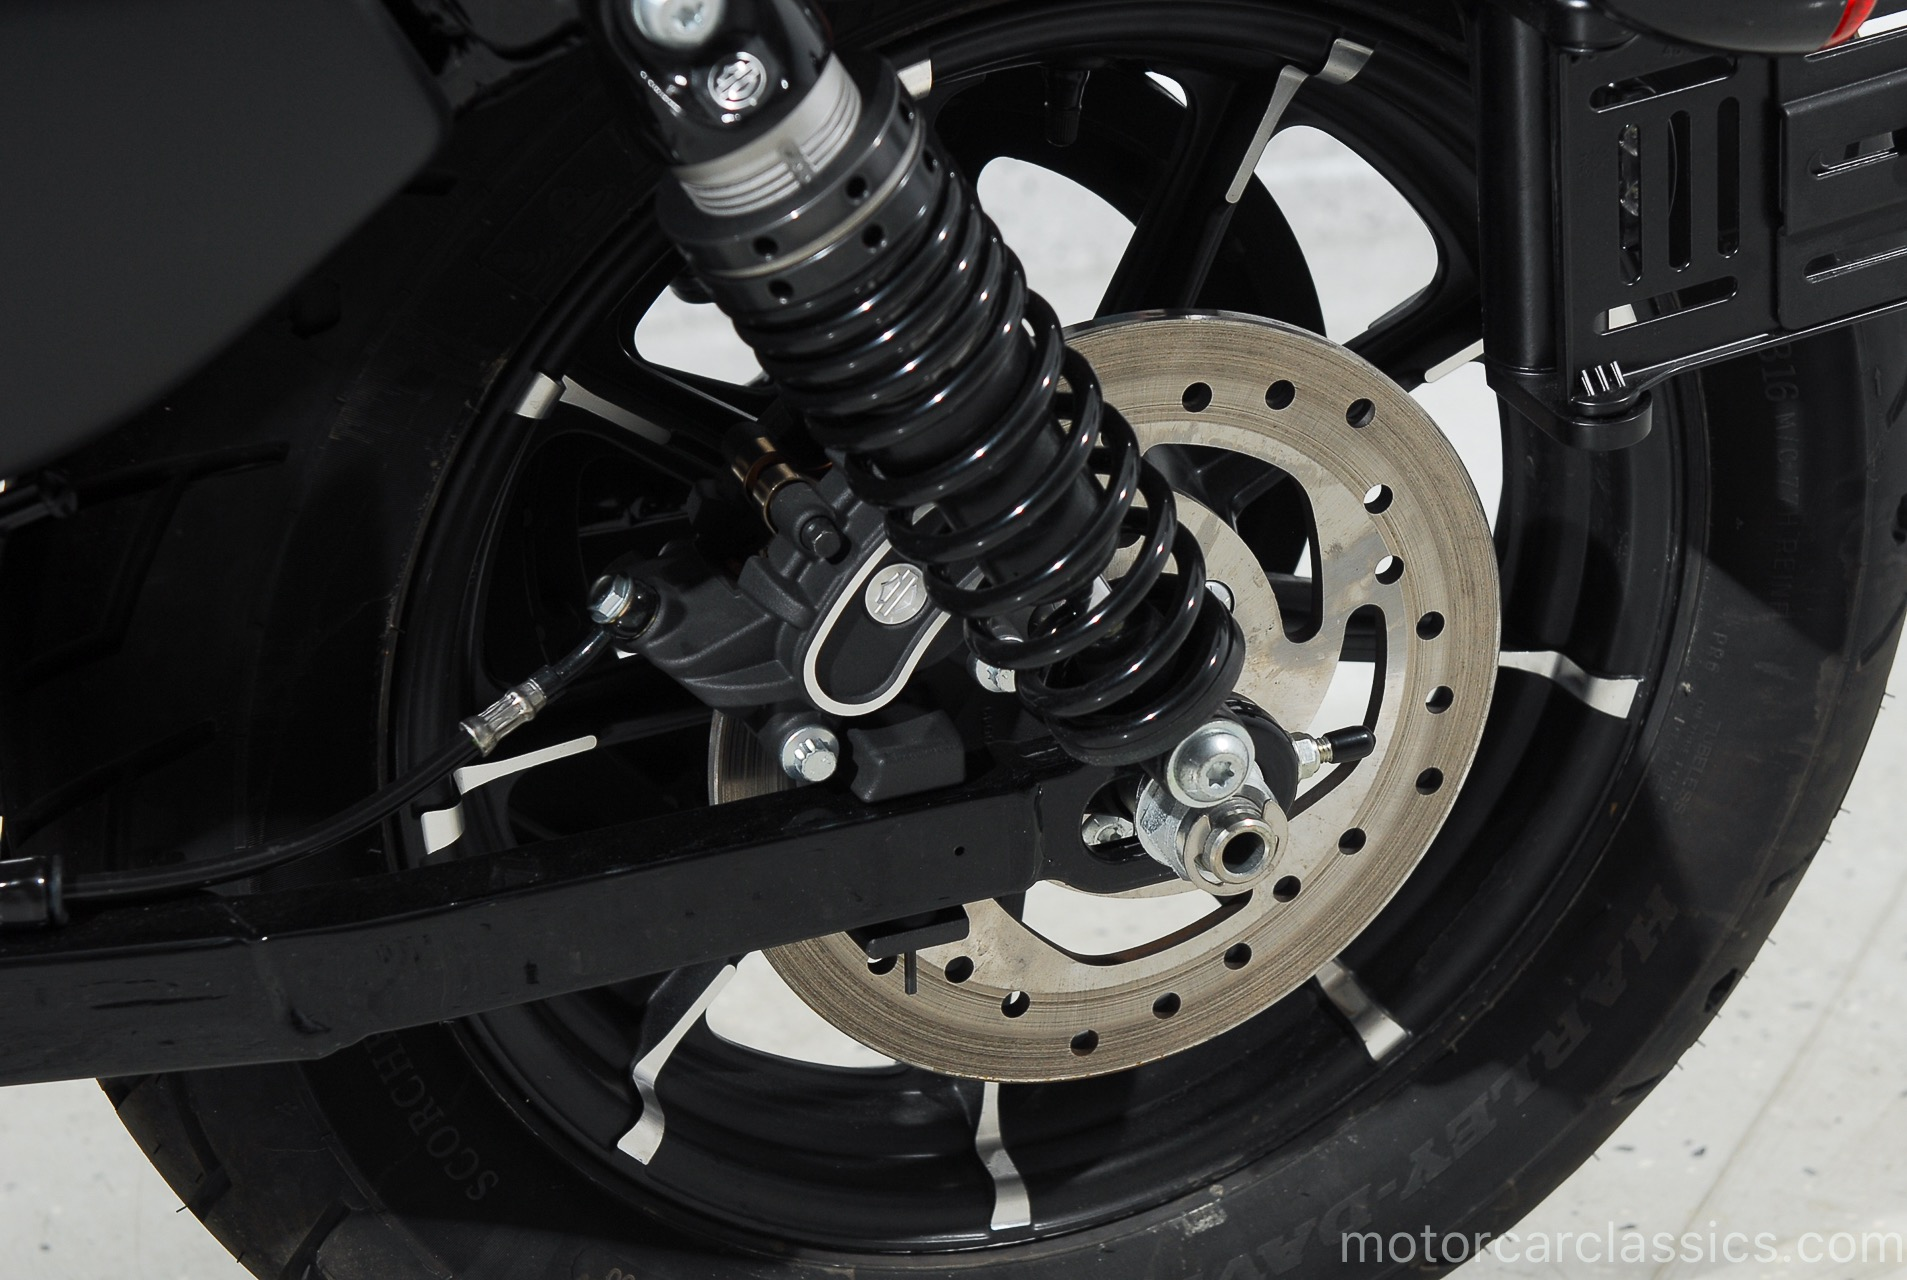 2017 Harley-Davidson XL1 JonBoy Custom